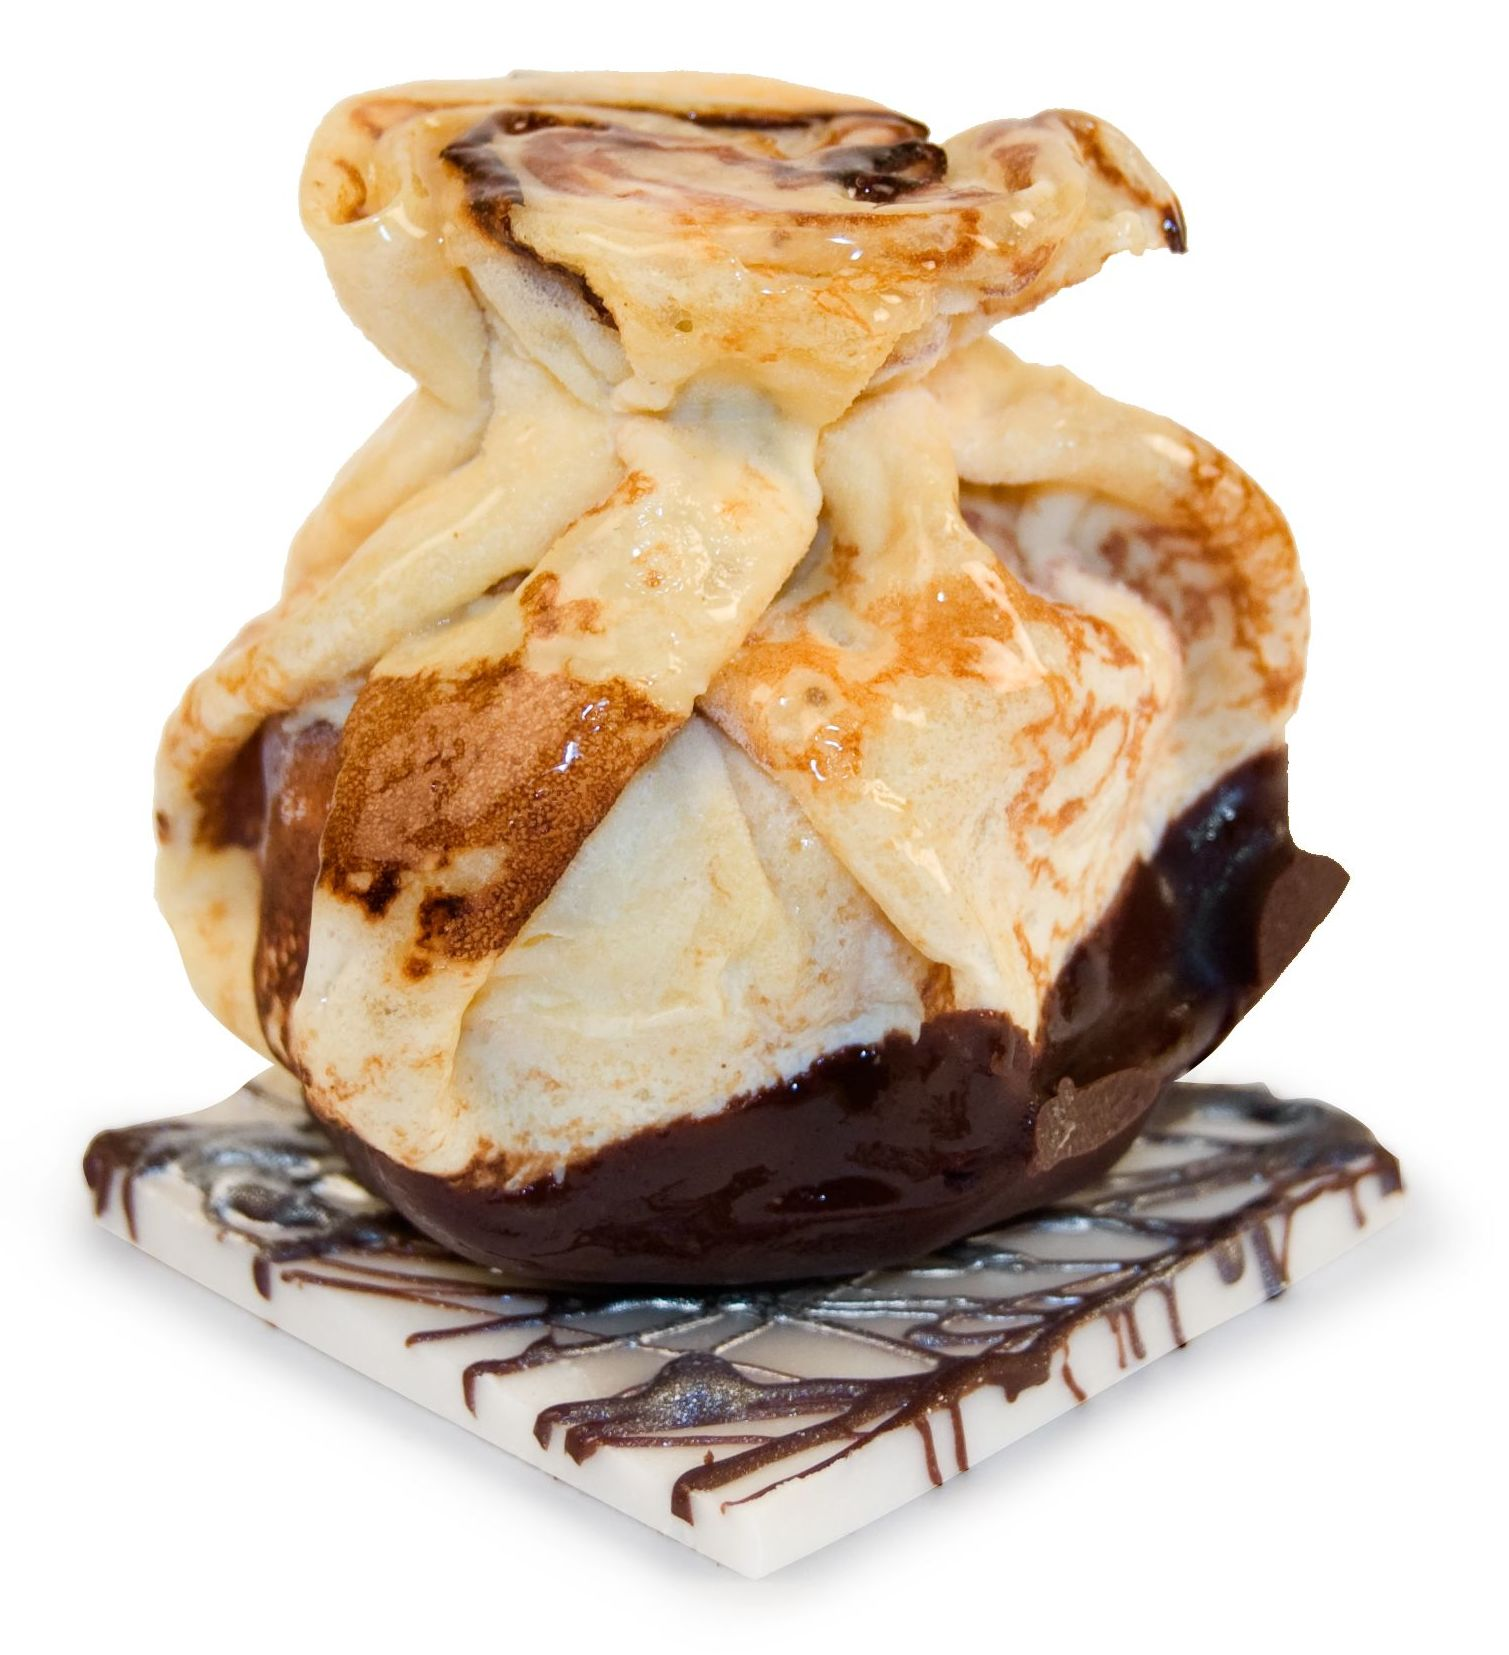 Auténtico crep artesanal relleno de bola de helado o de mousse.